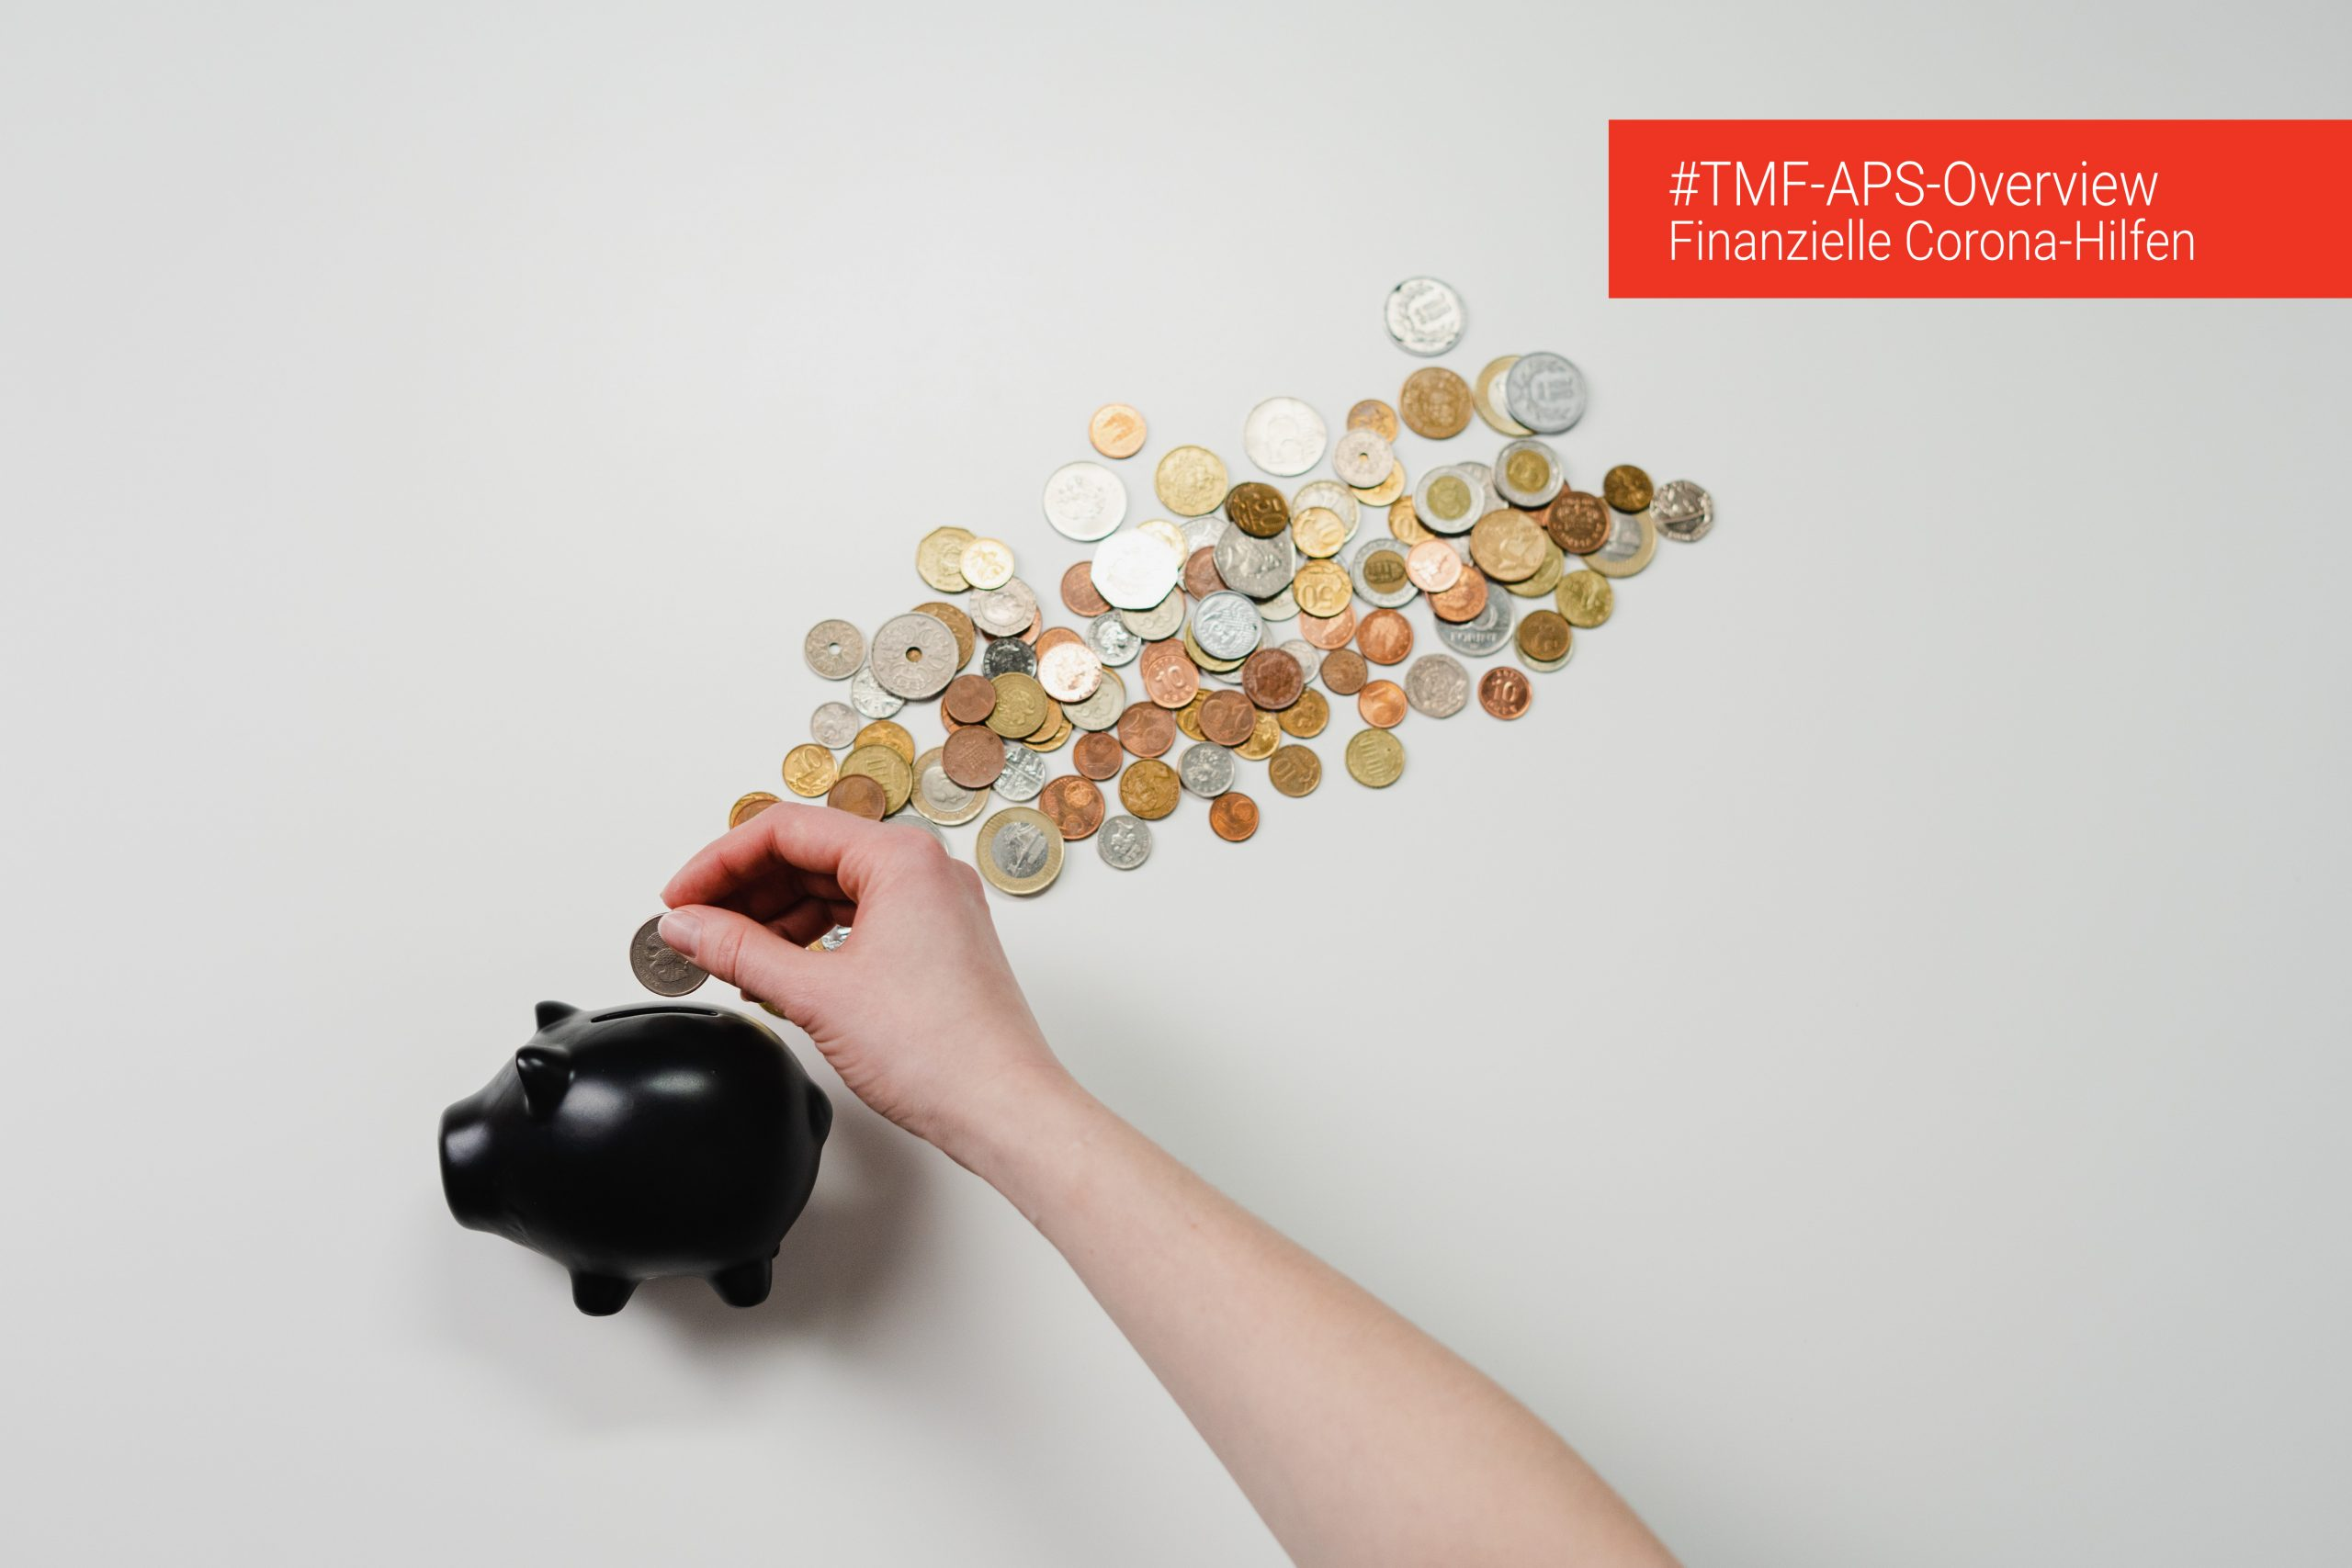 Die finanziellen Corona-Hilfen